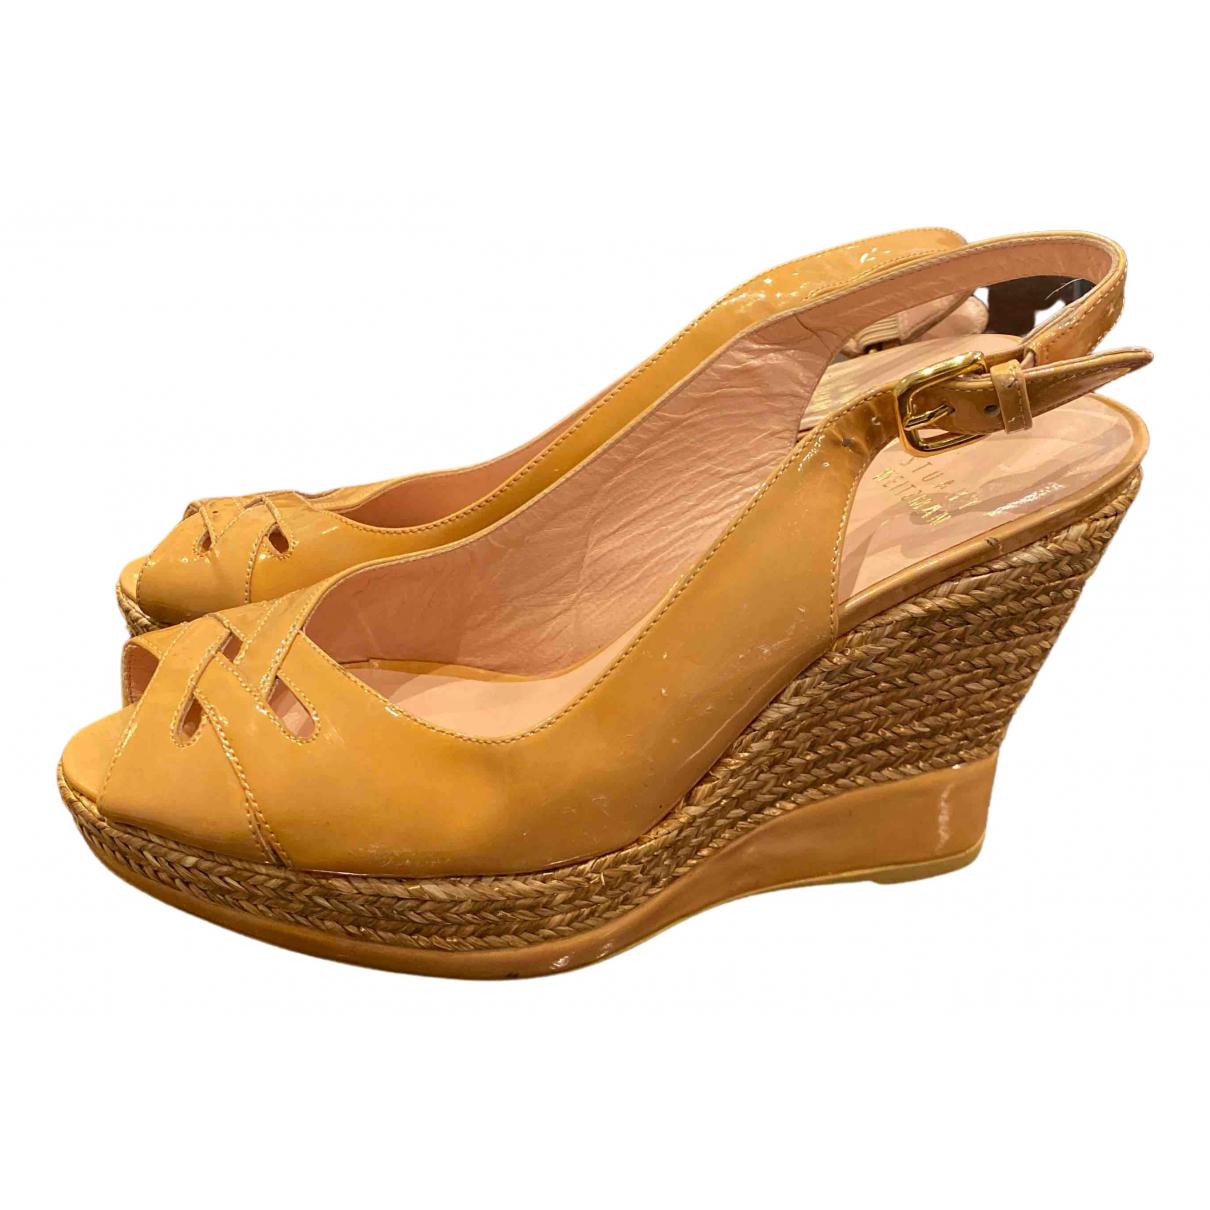 Stuart Weitzman N Beige Leather Sandals for Women 7 UK